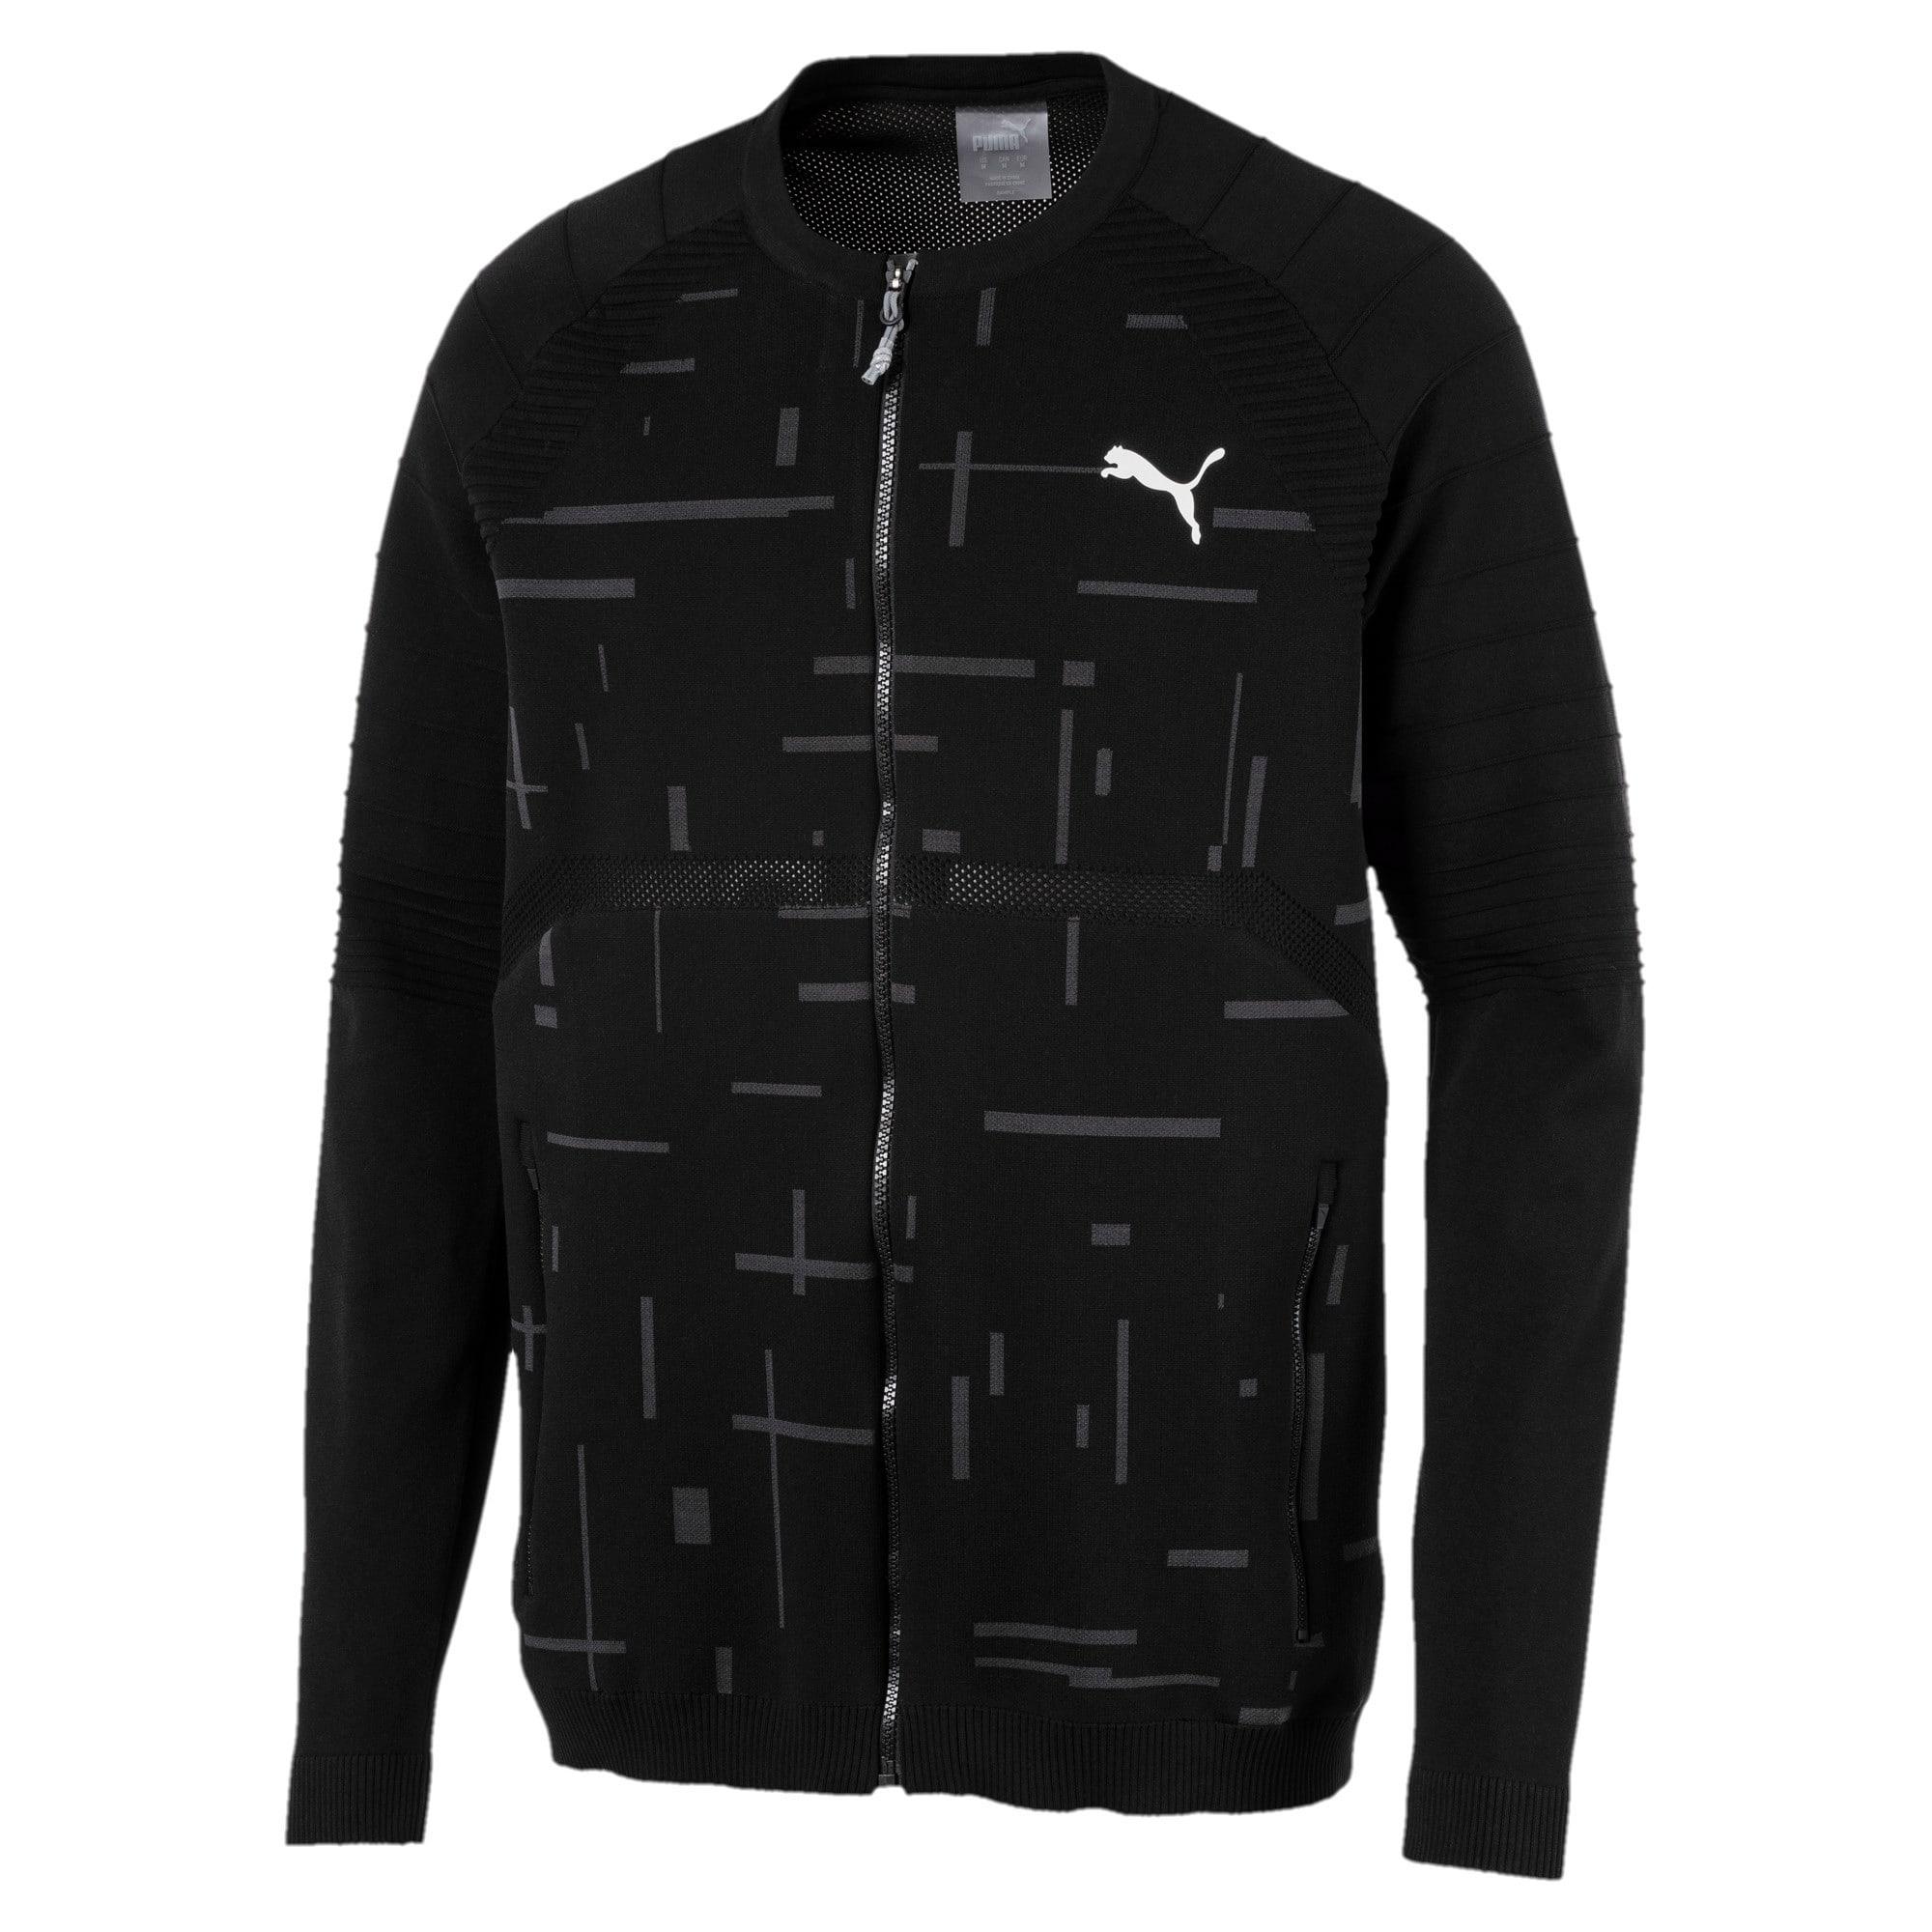 Thumbnail 3 of Energy evoKNIT Full Zip Men's Training Jacket, Puma Black, medium-IND